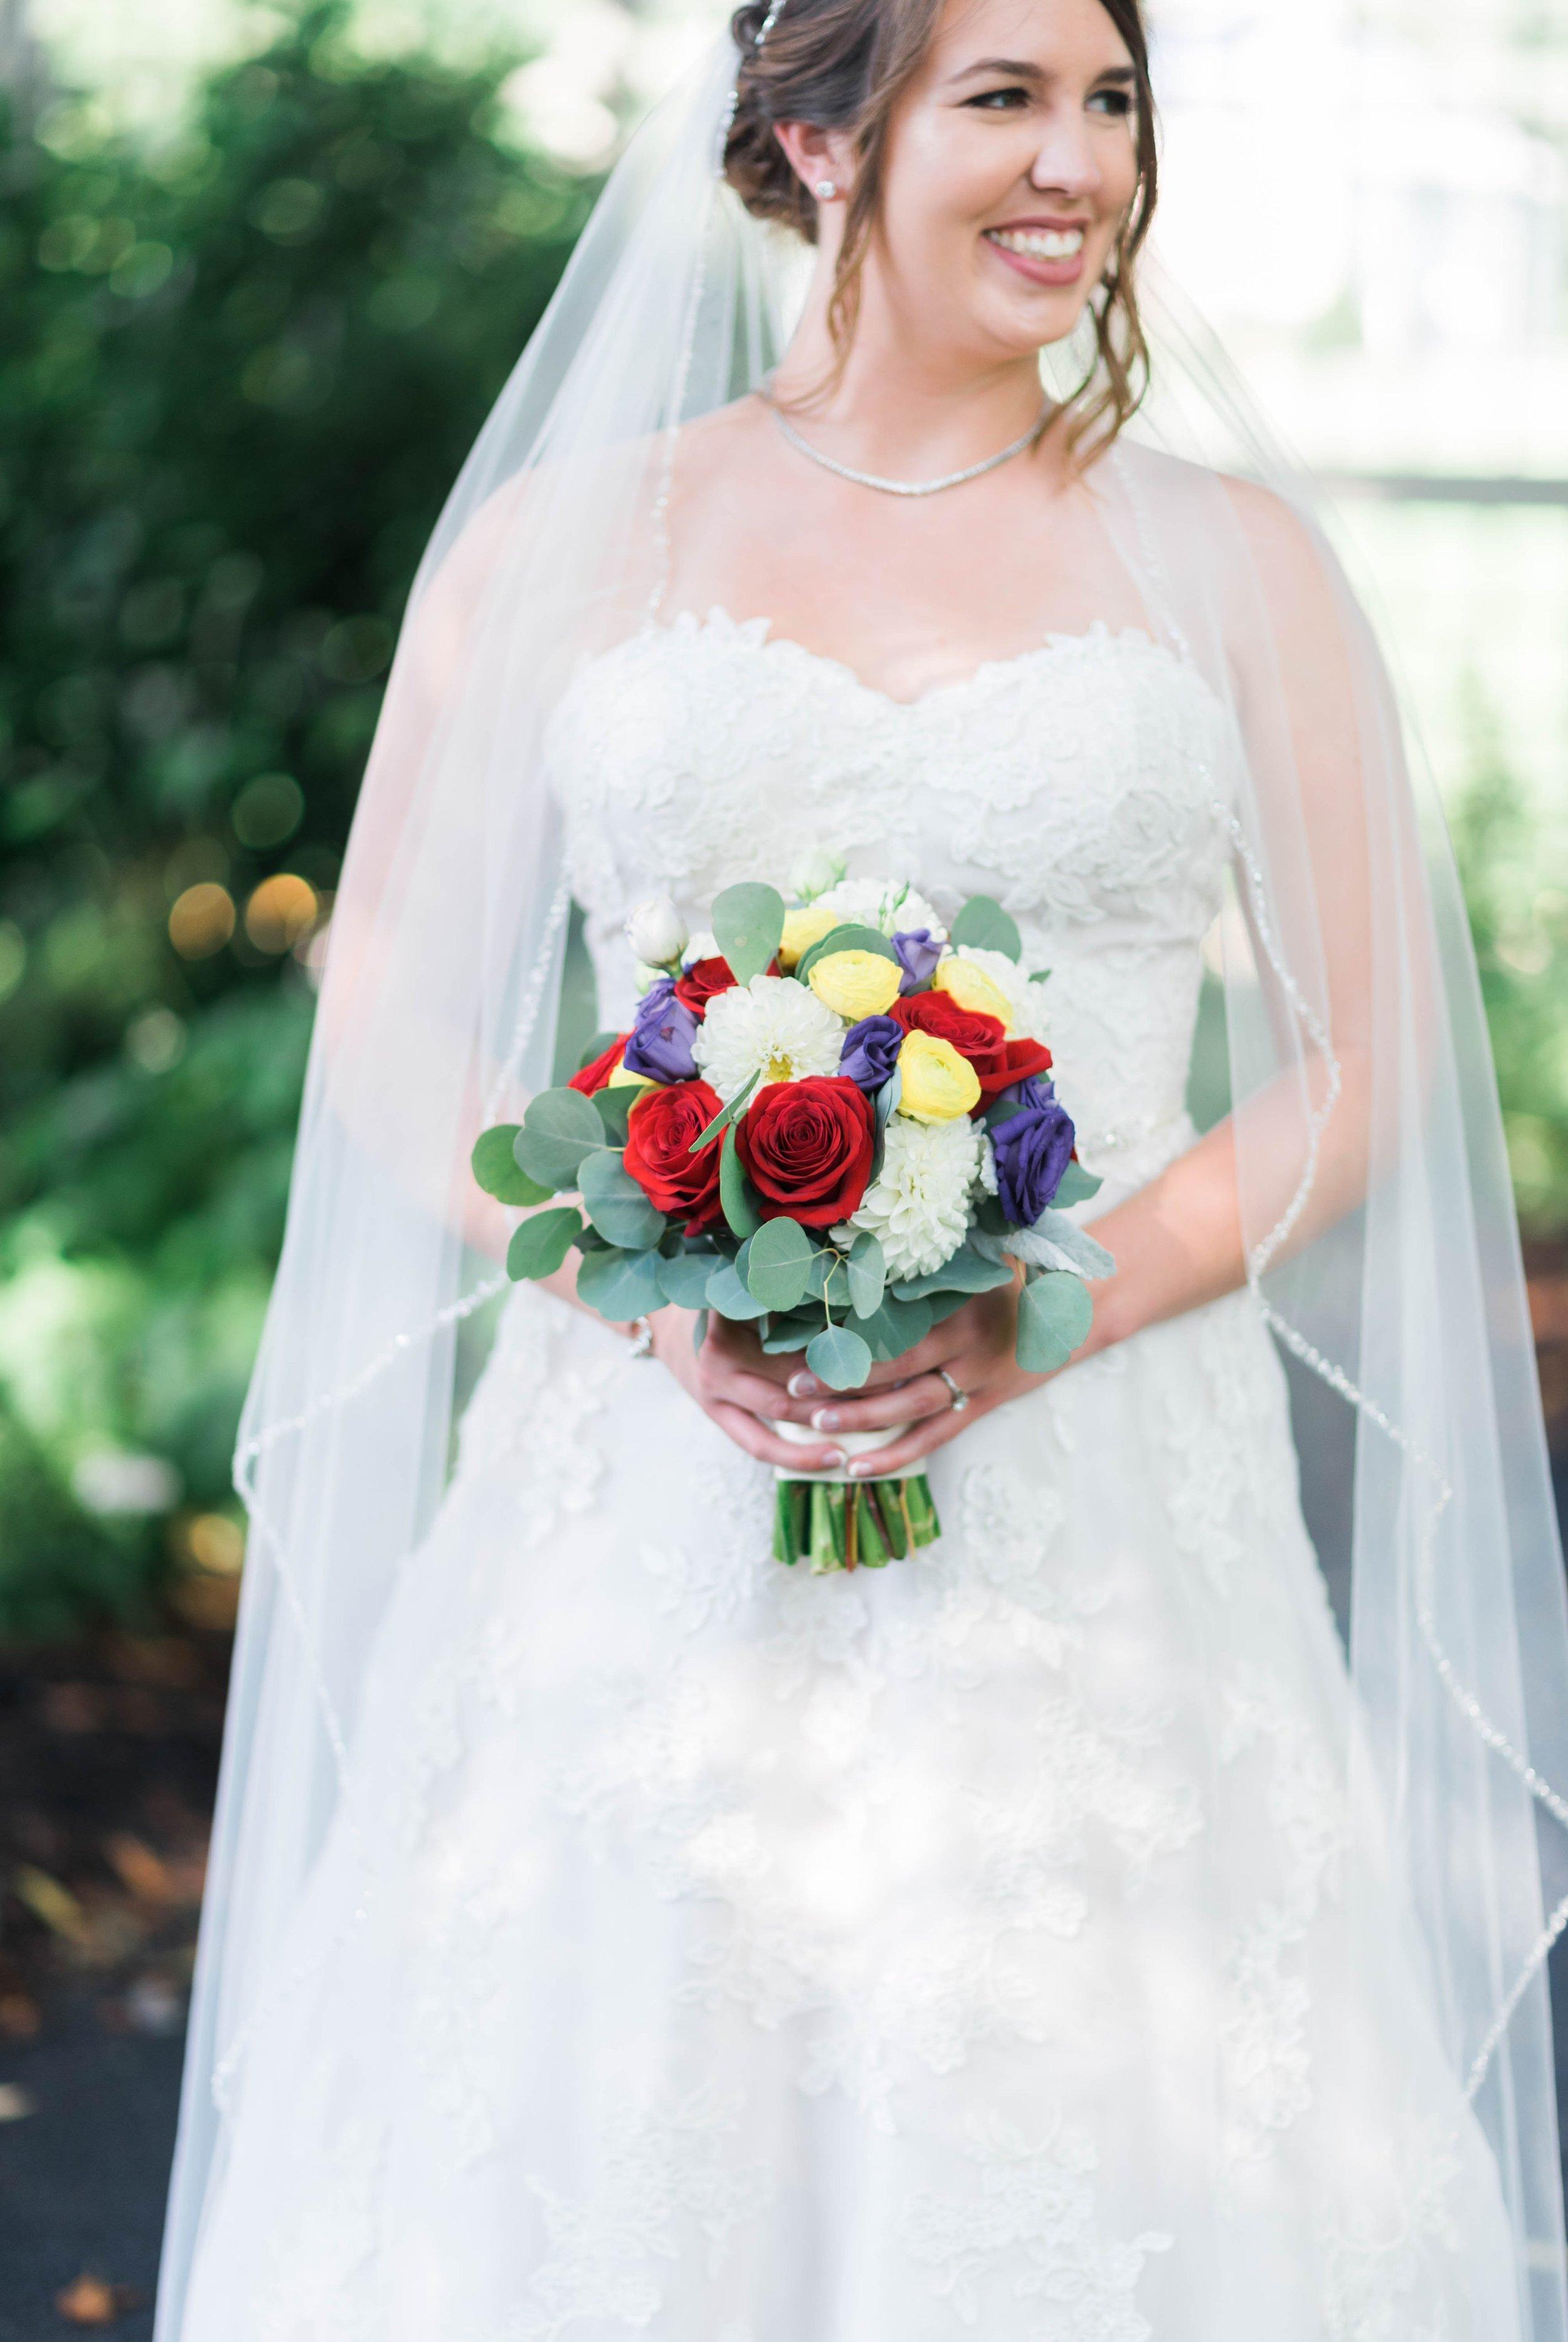 TheAtriumatMeadowlark_Virginiawedding photographer_lynchburgweddingphotographer_DCweddingPhotographer_KristinAaron 10.jpg